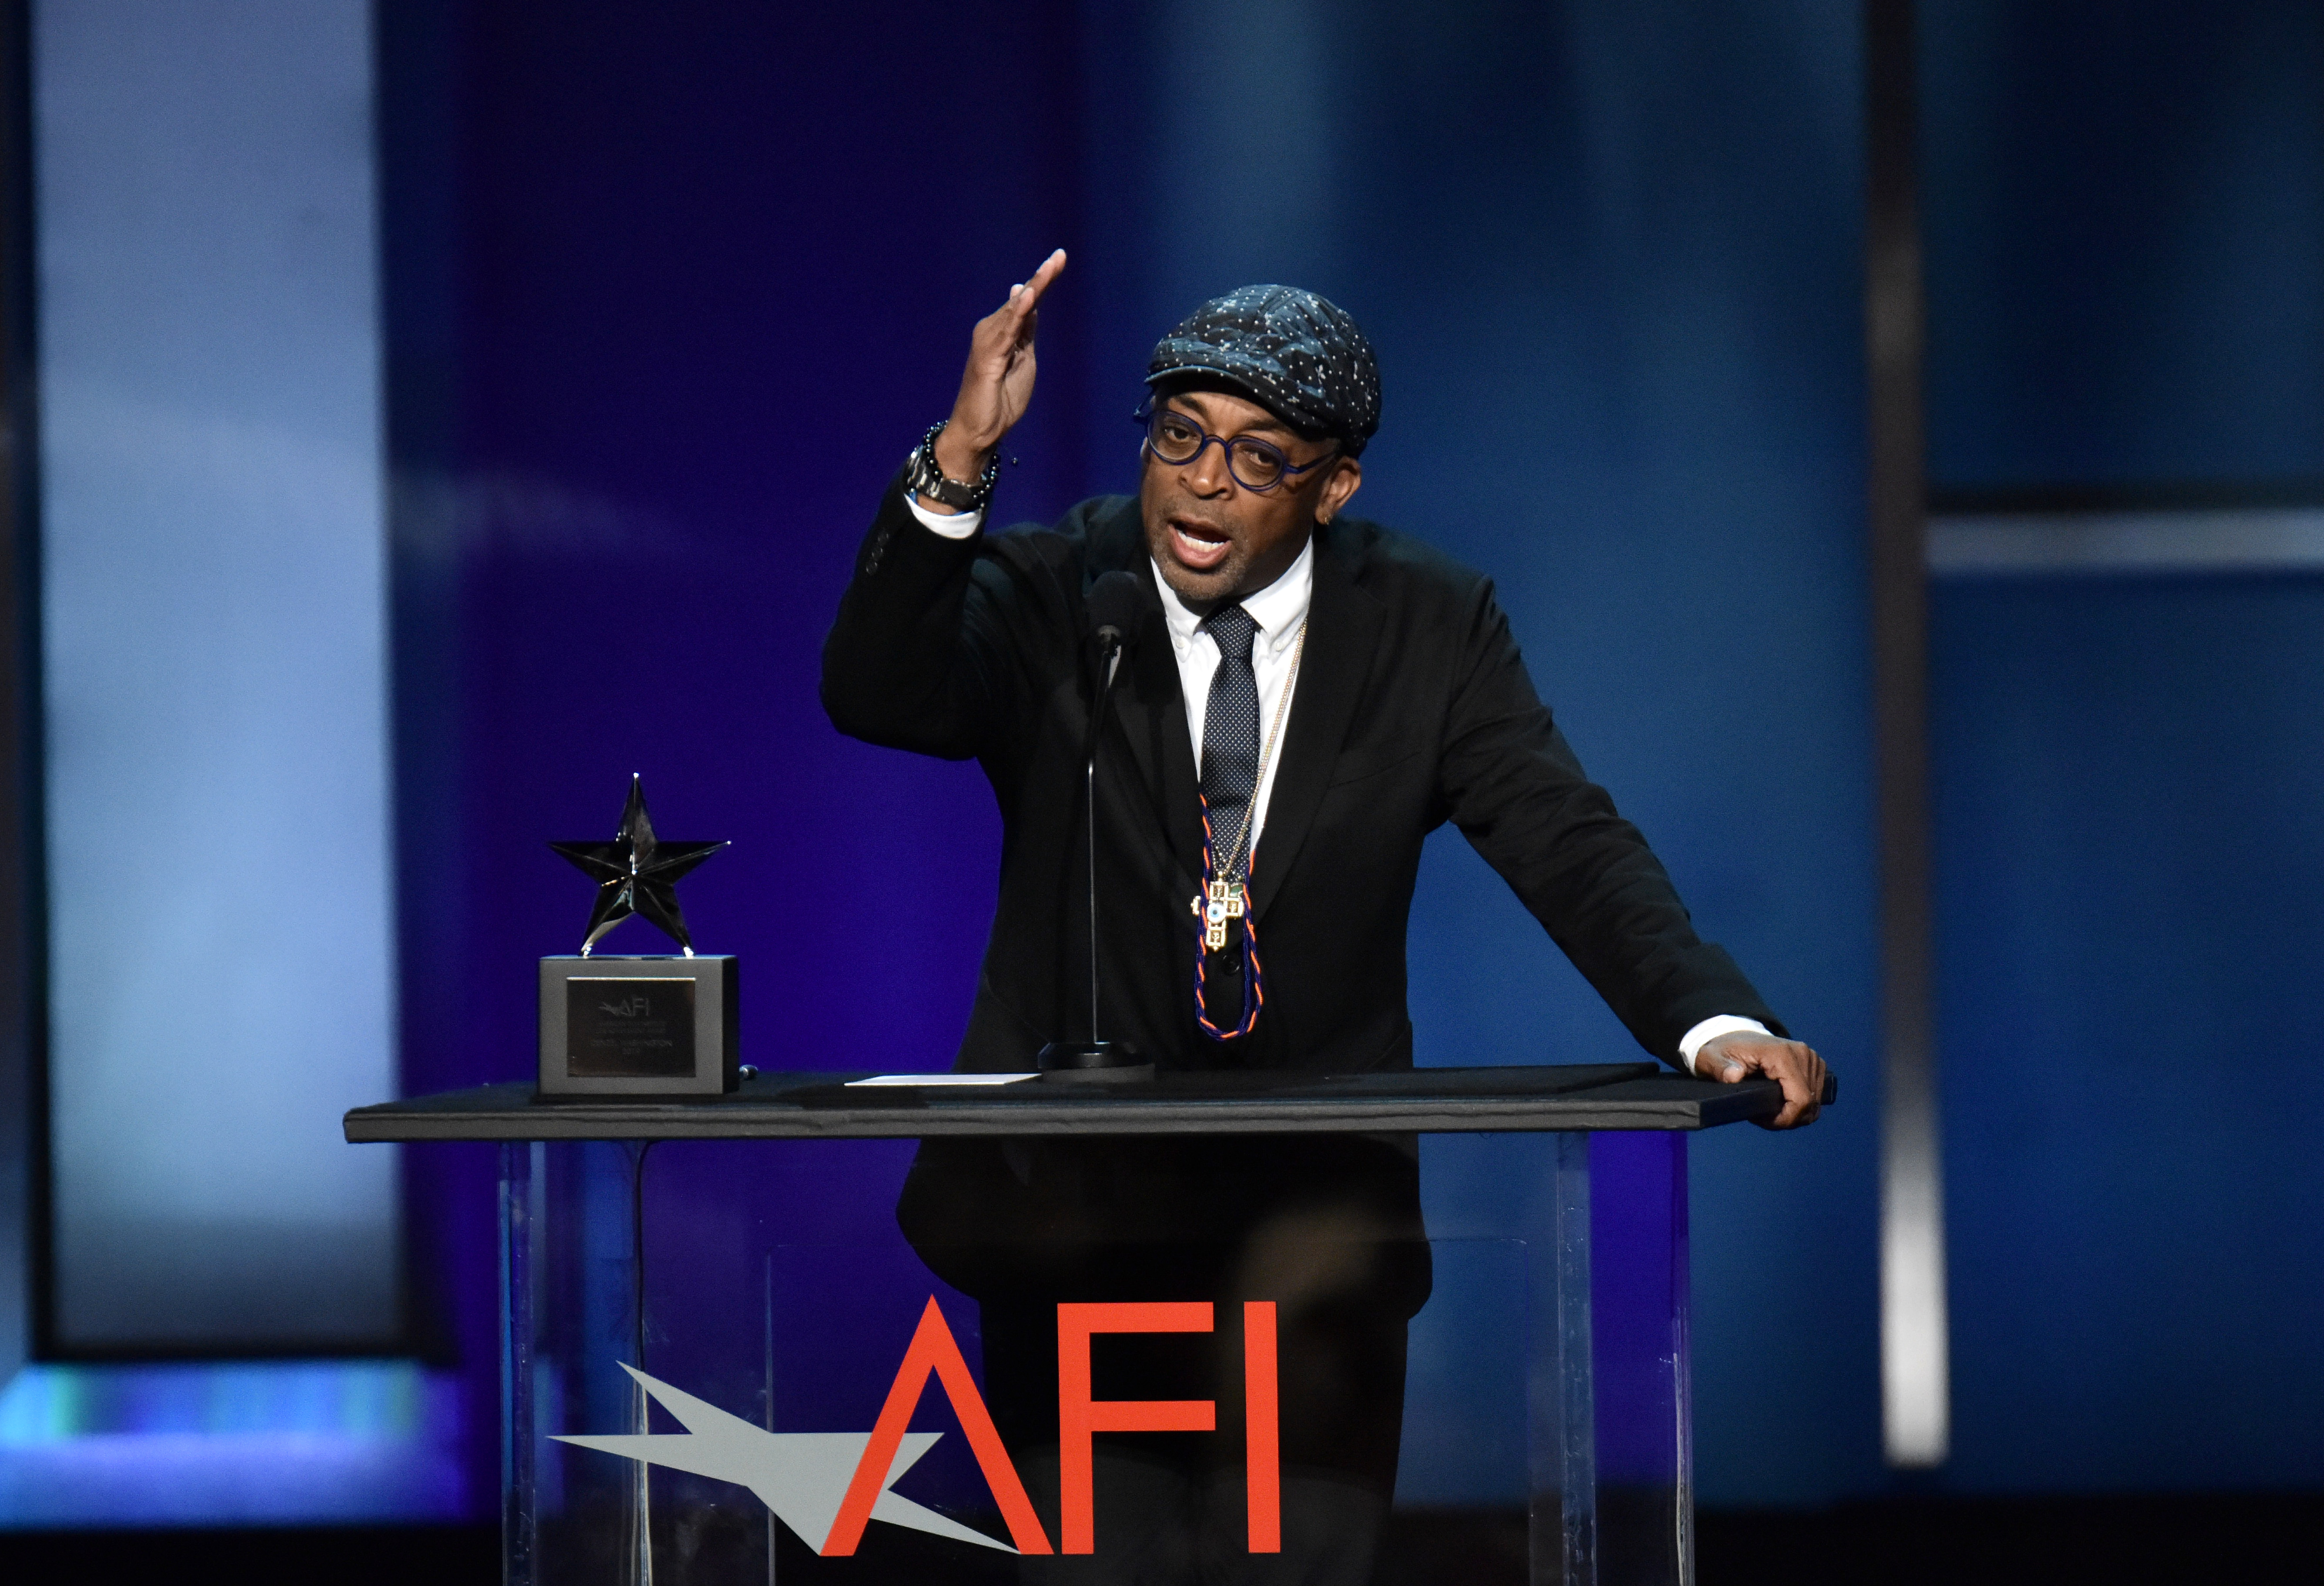 Spike LeeAFI Honors Denzel Washington, Show, Dolby Theatre, Los Angeles, USA - 06 Jun 2019